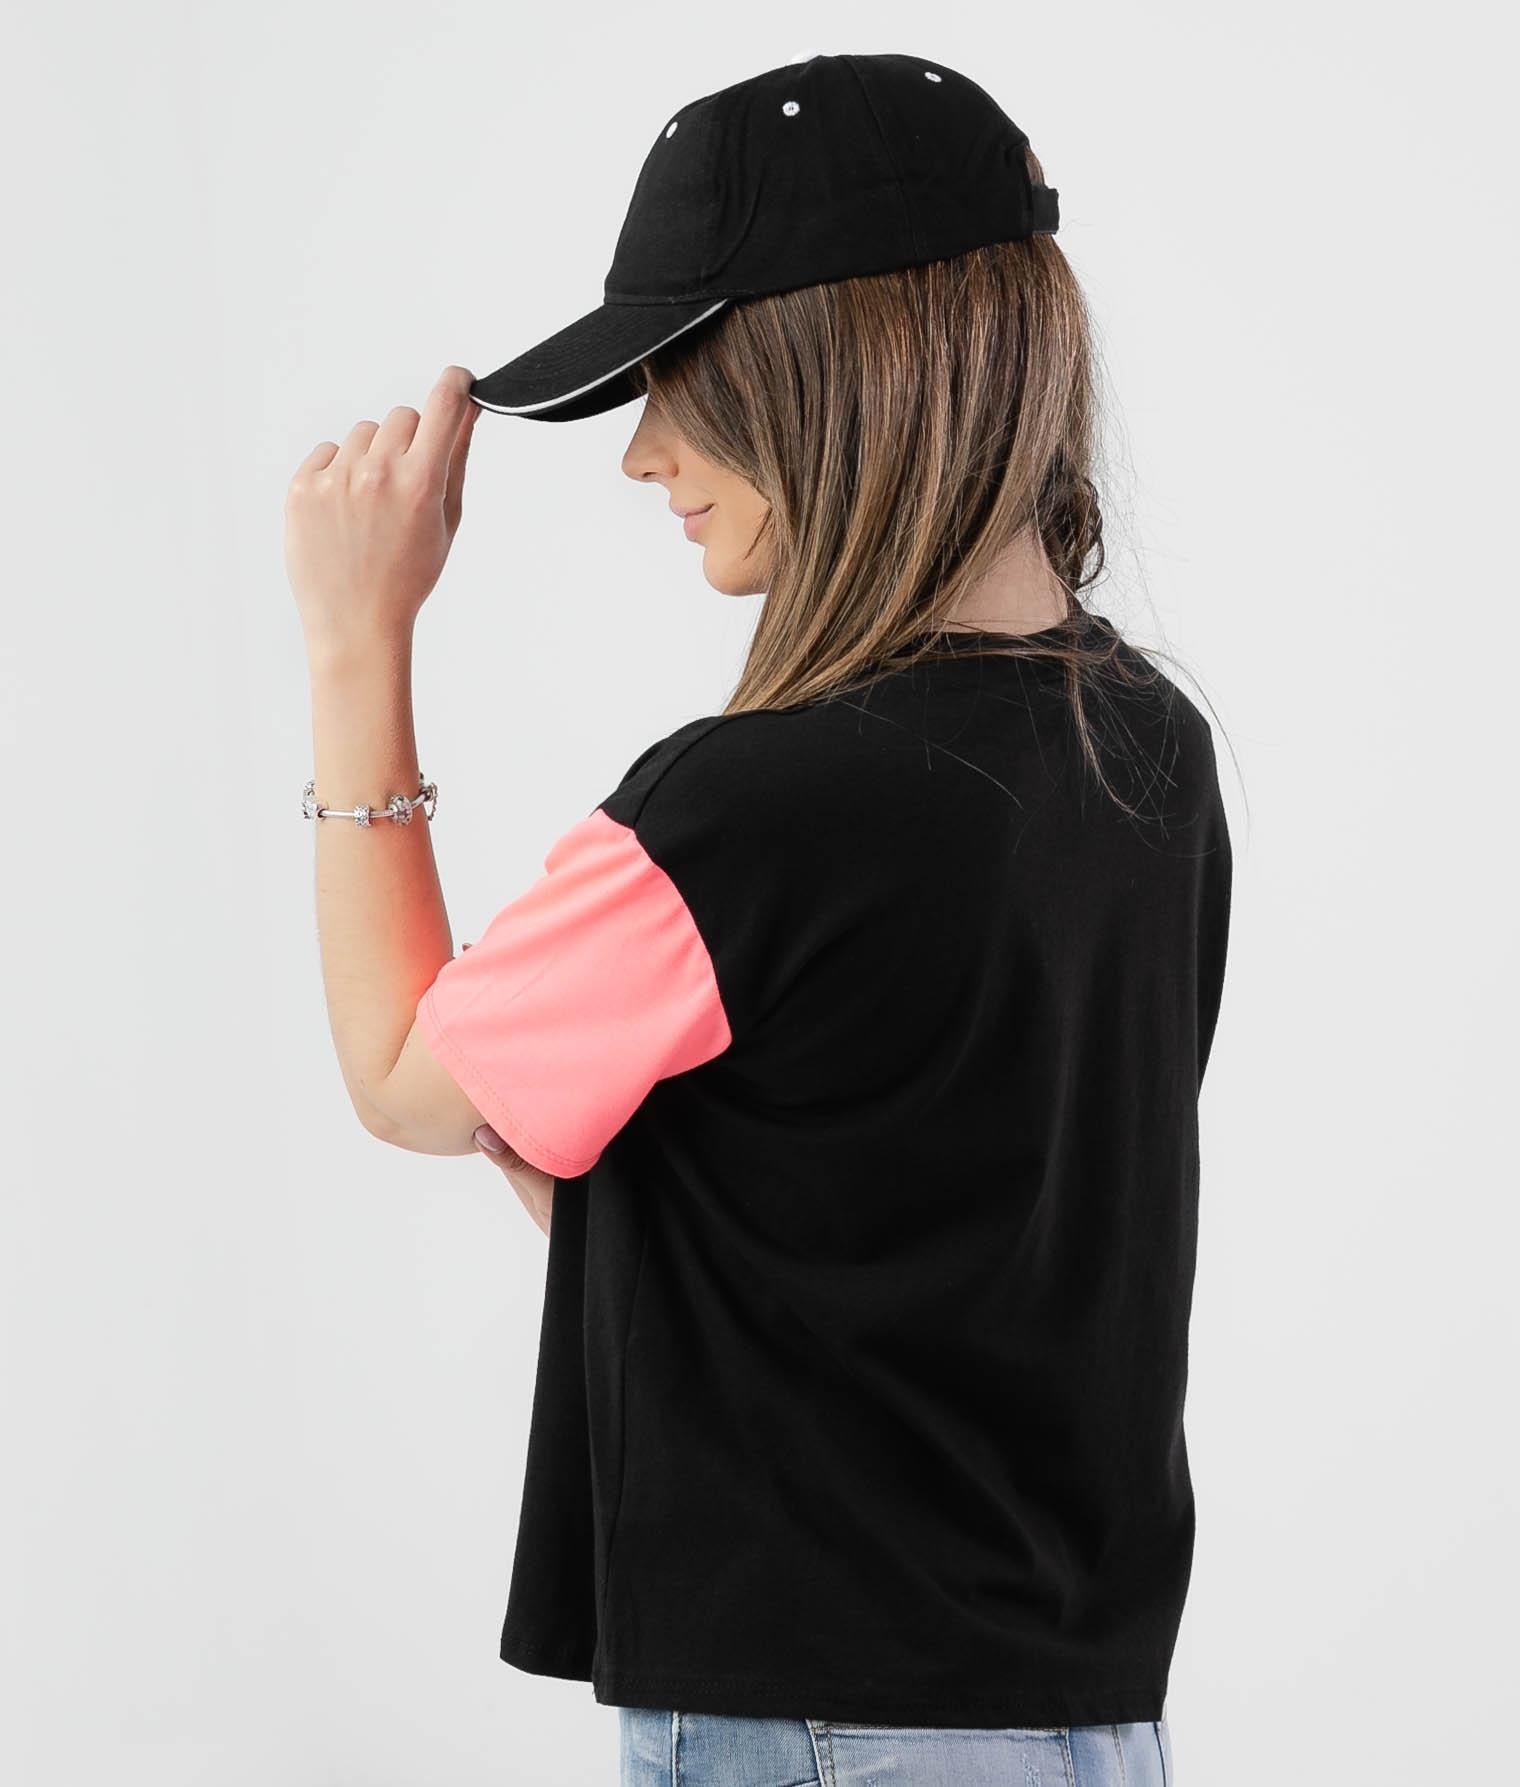 PANY CAP - BLACK